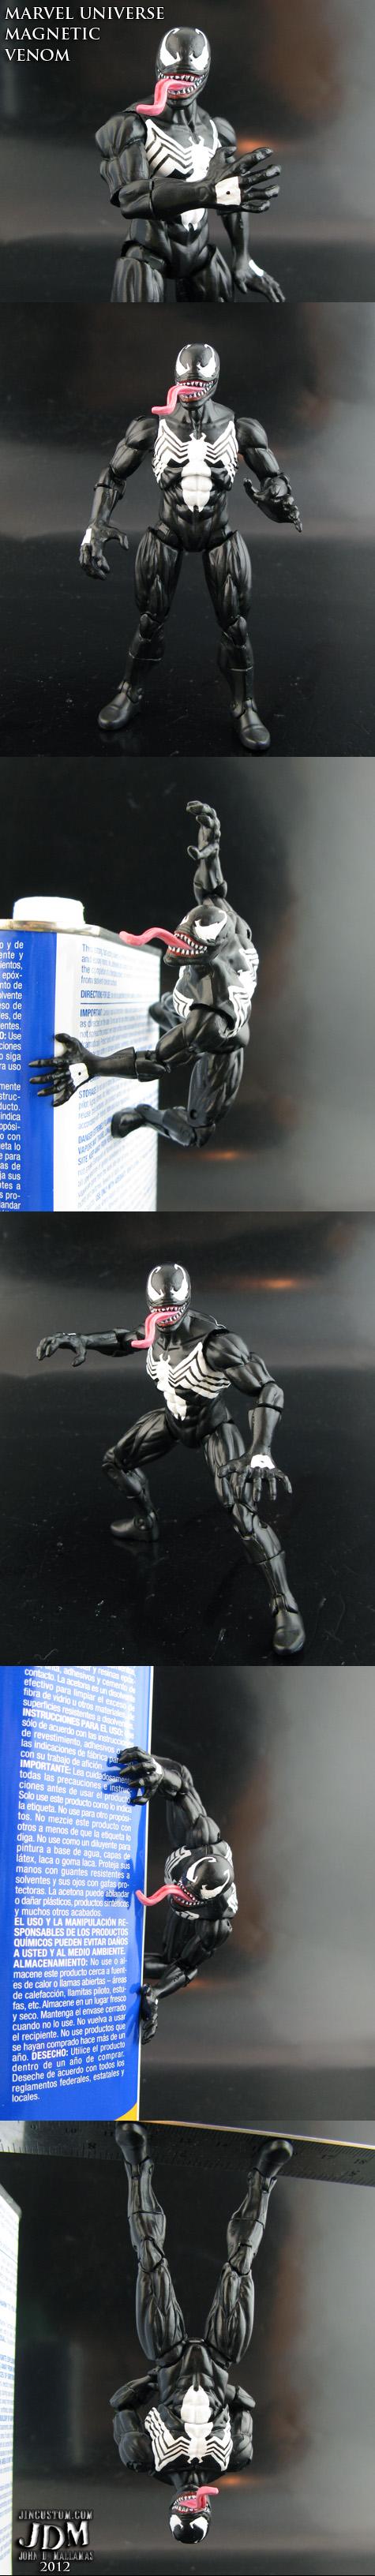 Venom Spiderman Action Figure